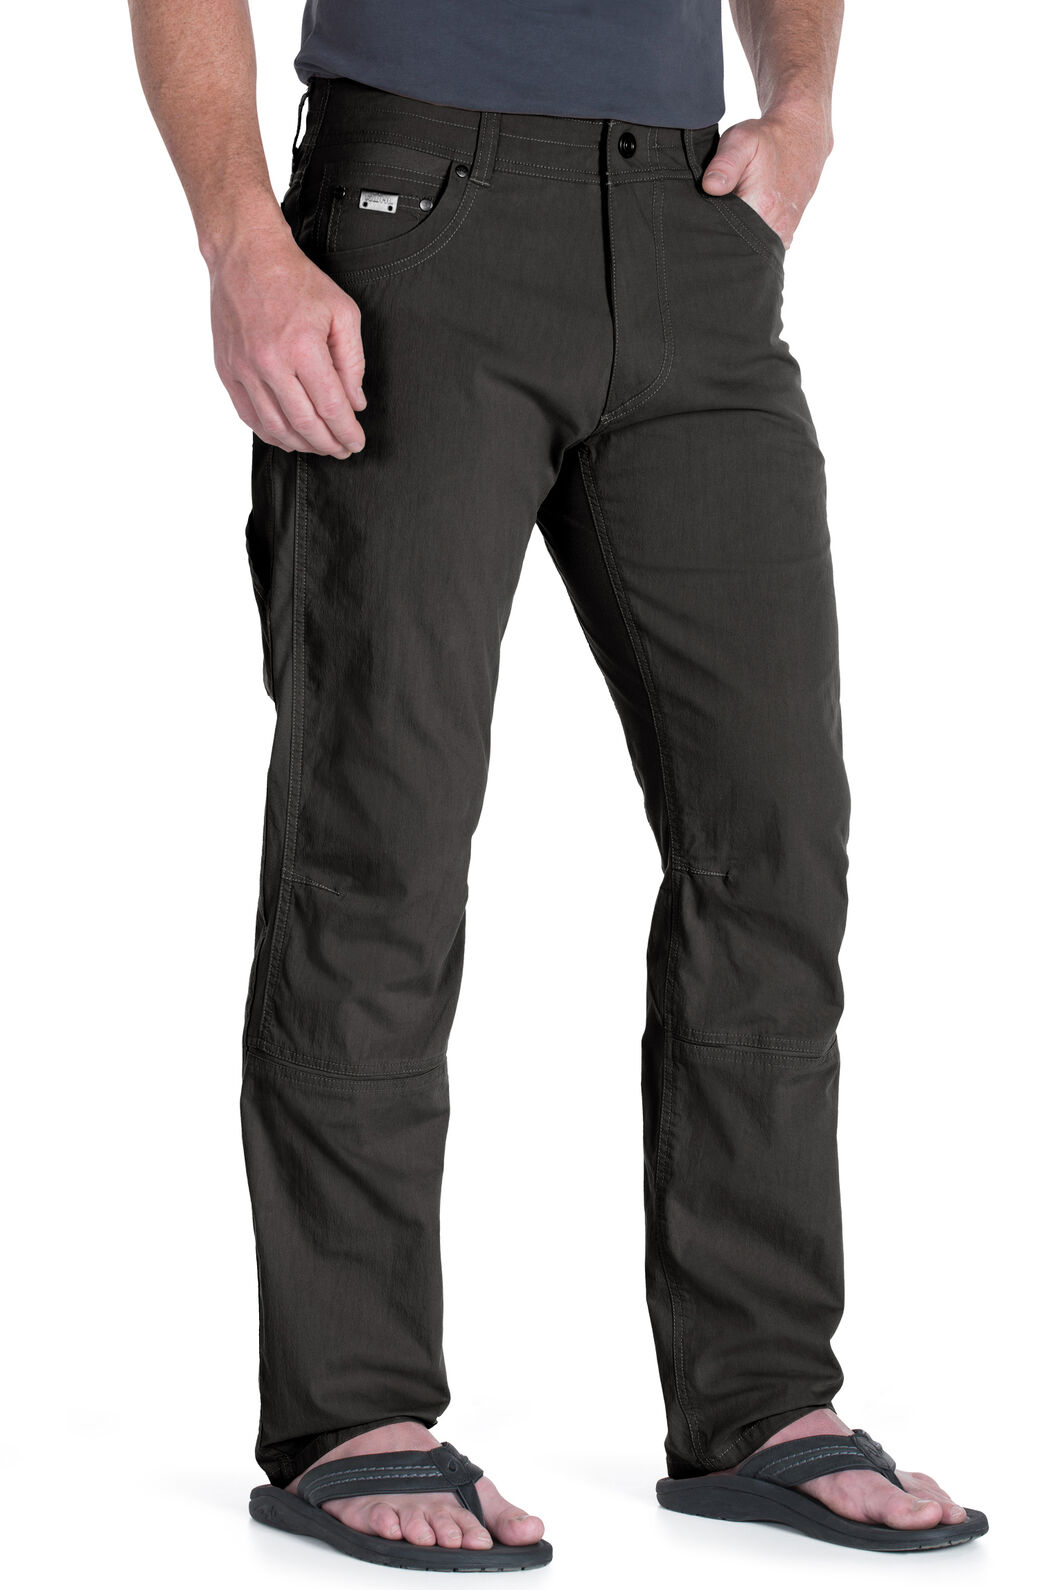 Kuhl Radikl Pants (30 inch leg) - Men's, Carbon, hi-res